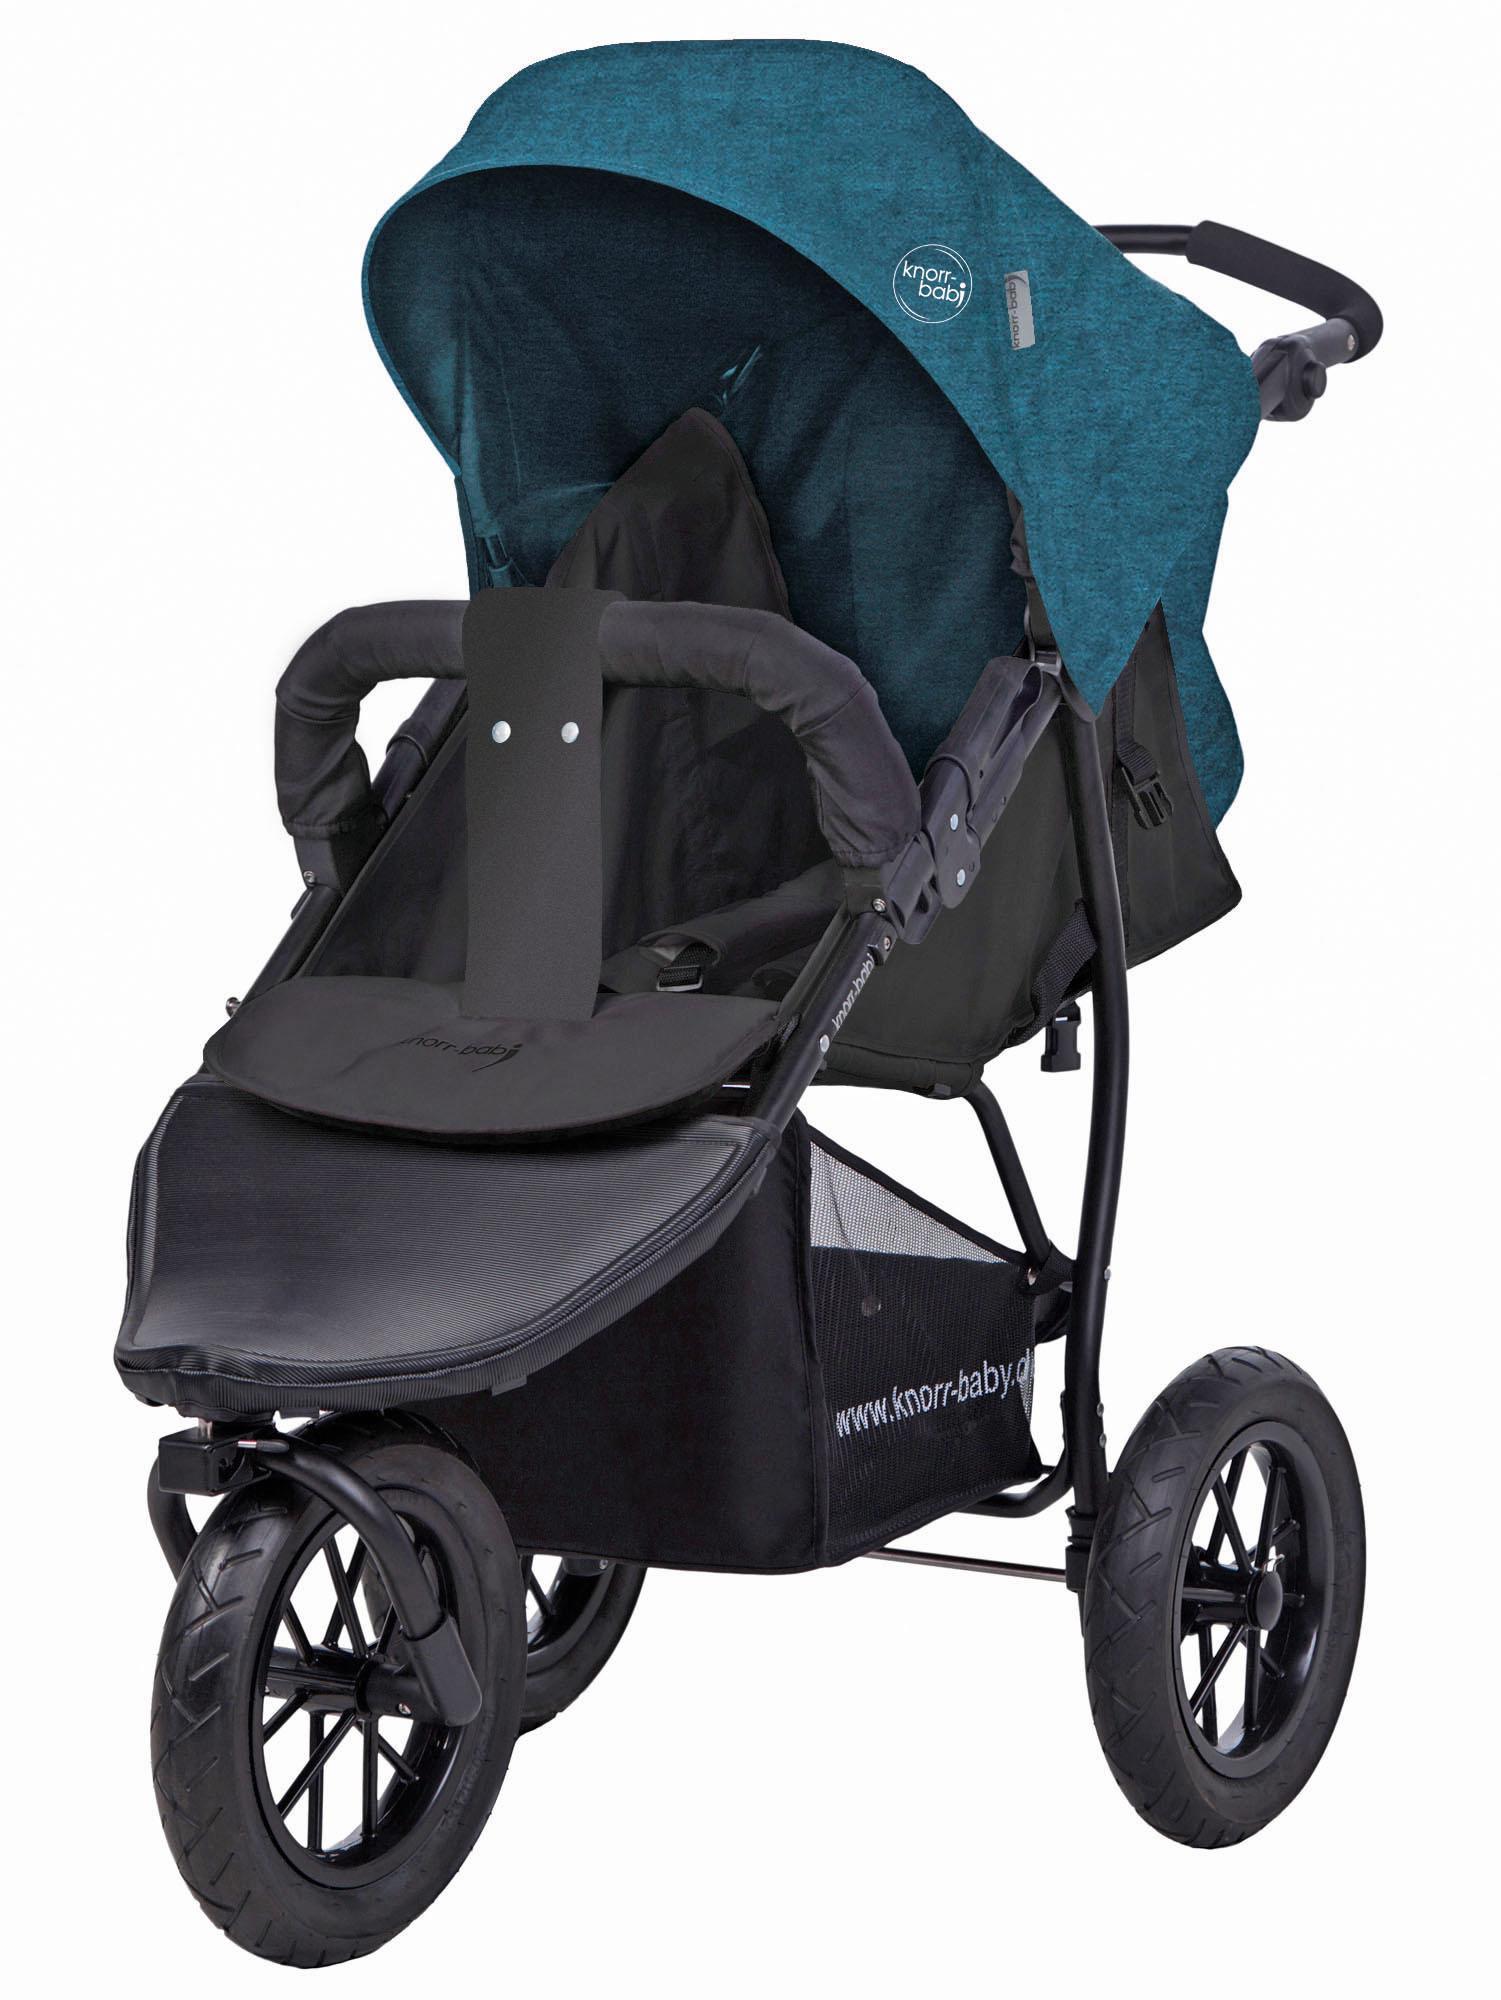 "Knorrbaby Jogger-Kinderwagen ""Joggy S Melange petrol"" Kindermode/Ausstattung/Kinderwagen & Buggies/Kinderwagen/Jogger-Kinderwagen"